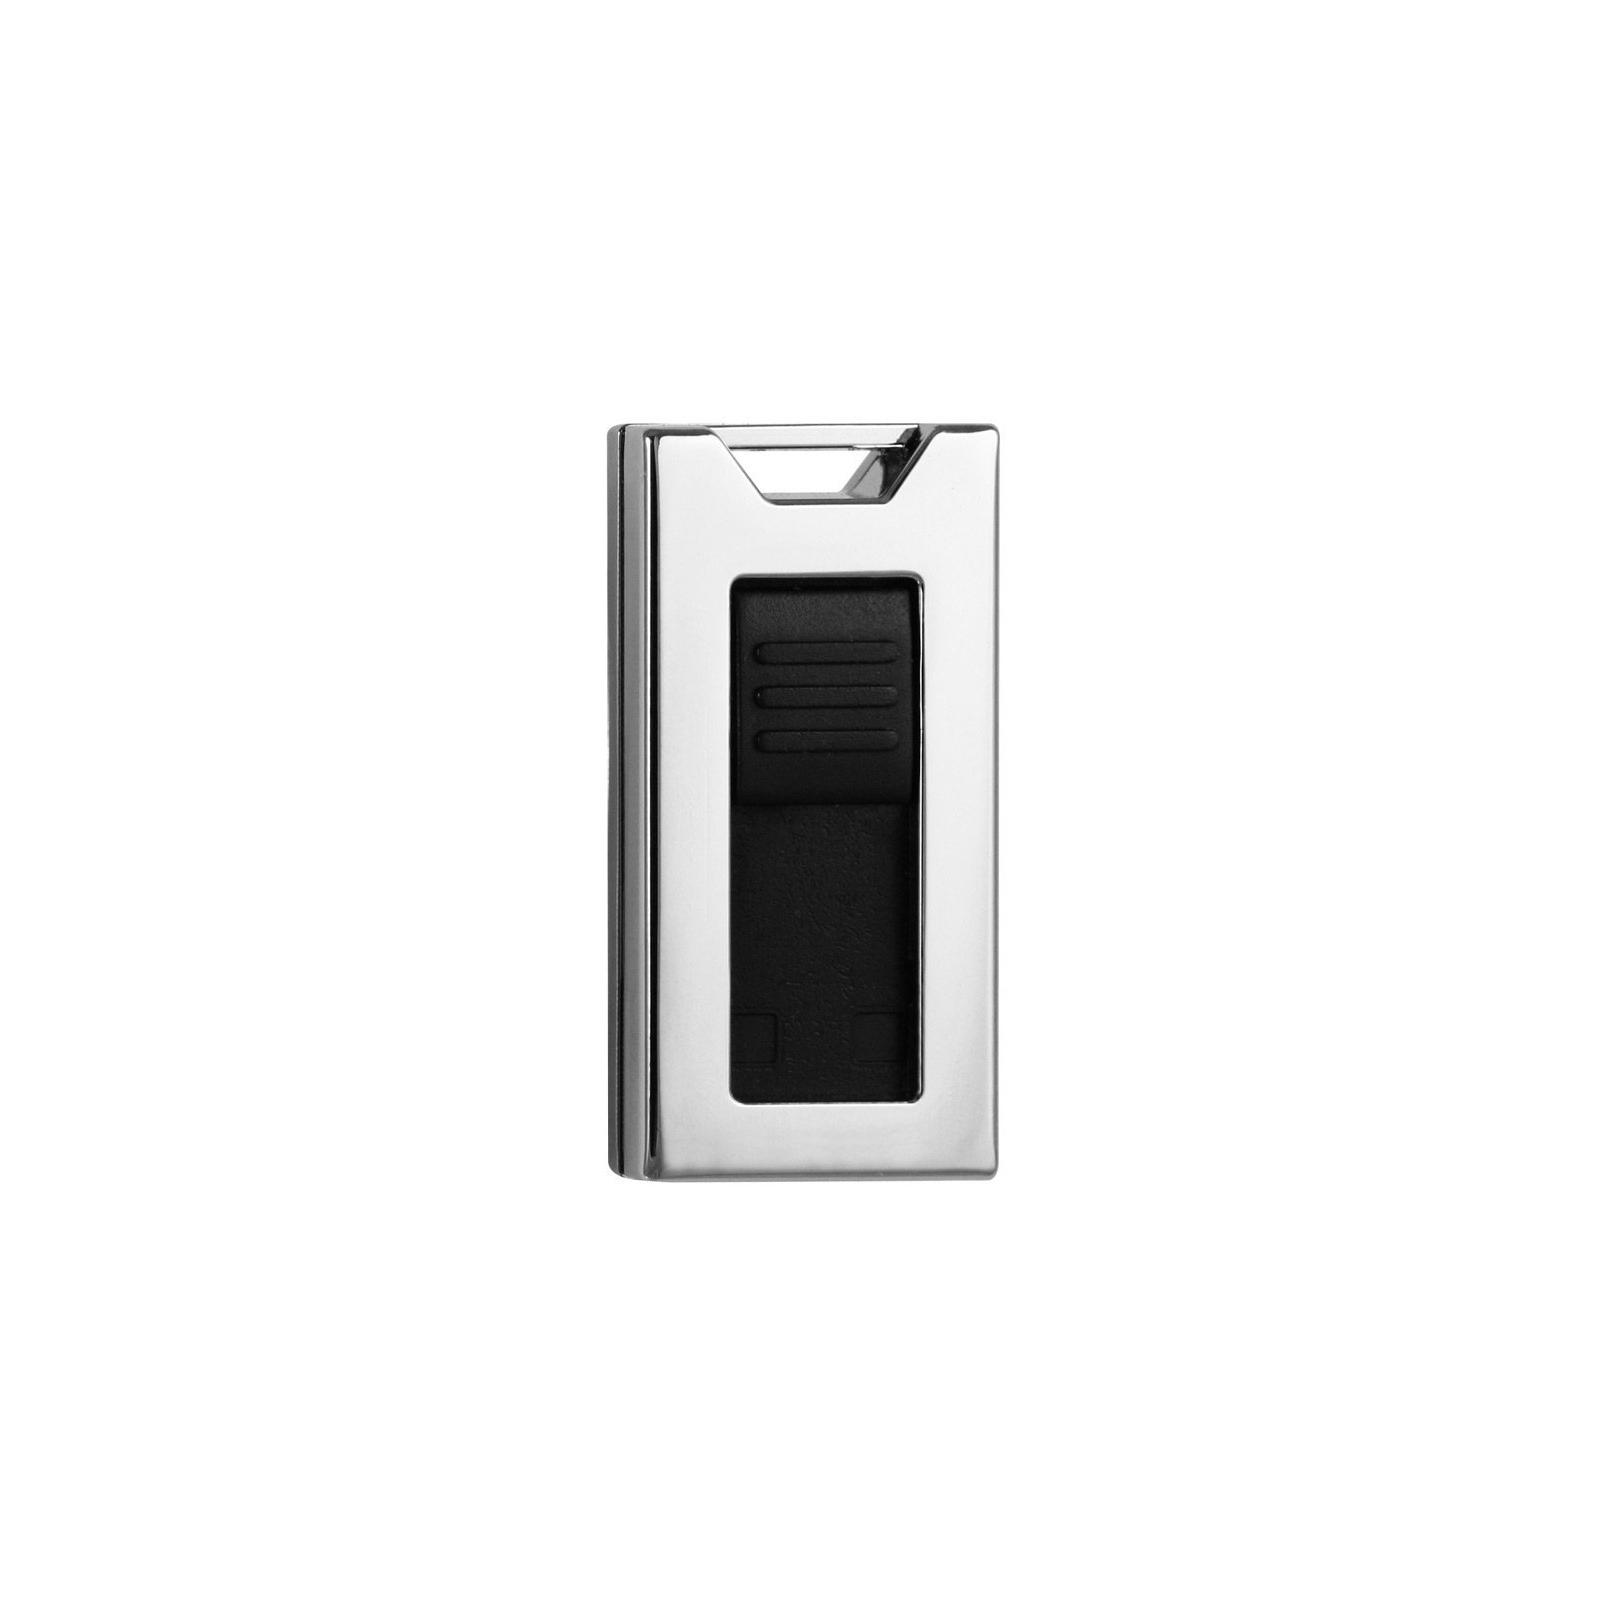 USB флеш накопитель Silicon Power 8Gb 850 amber (SP008GBUF2850V1A) изображение 3